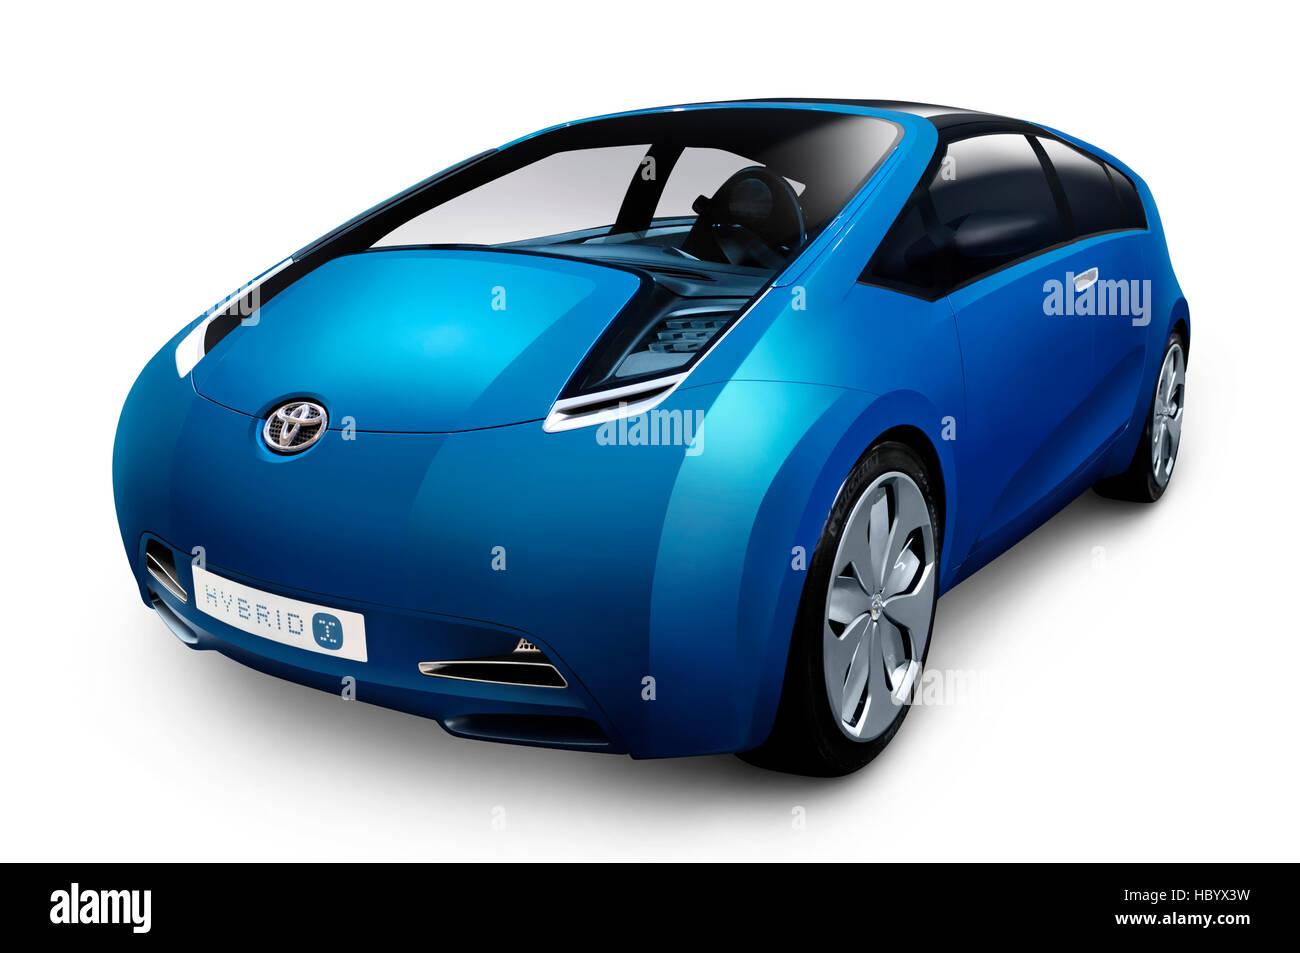 Toyota Hybrid-X concept car ibrida Immagini Stock